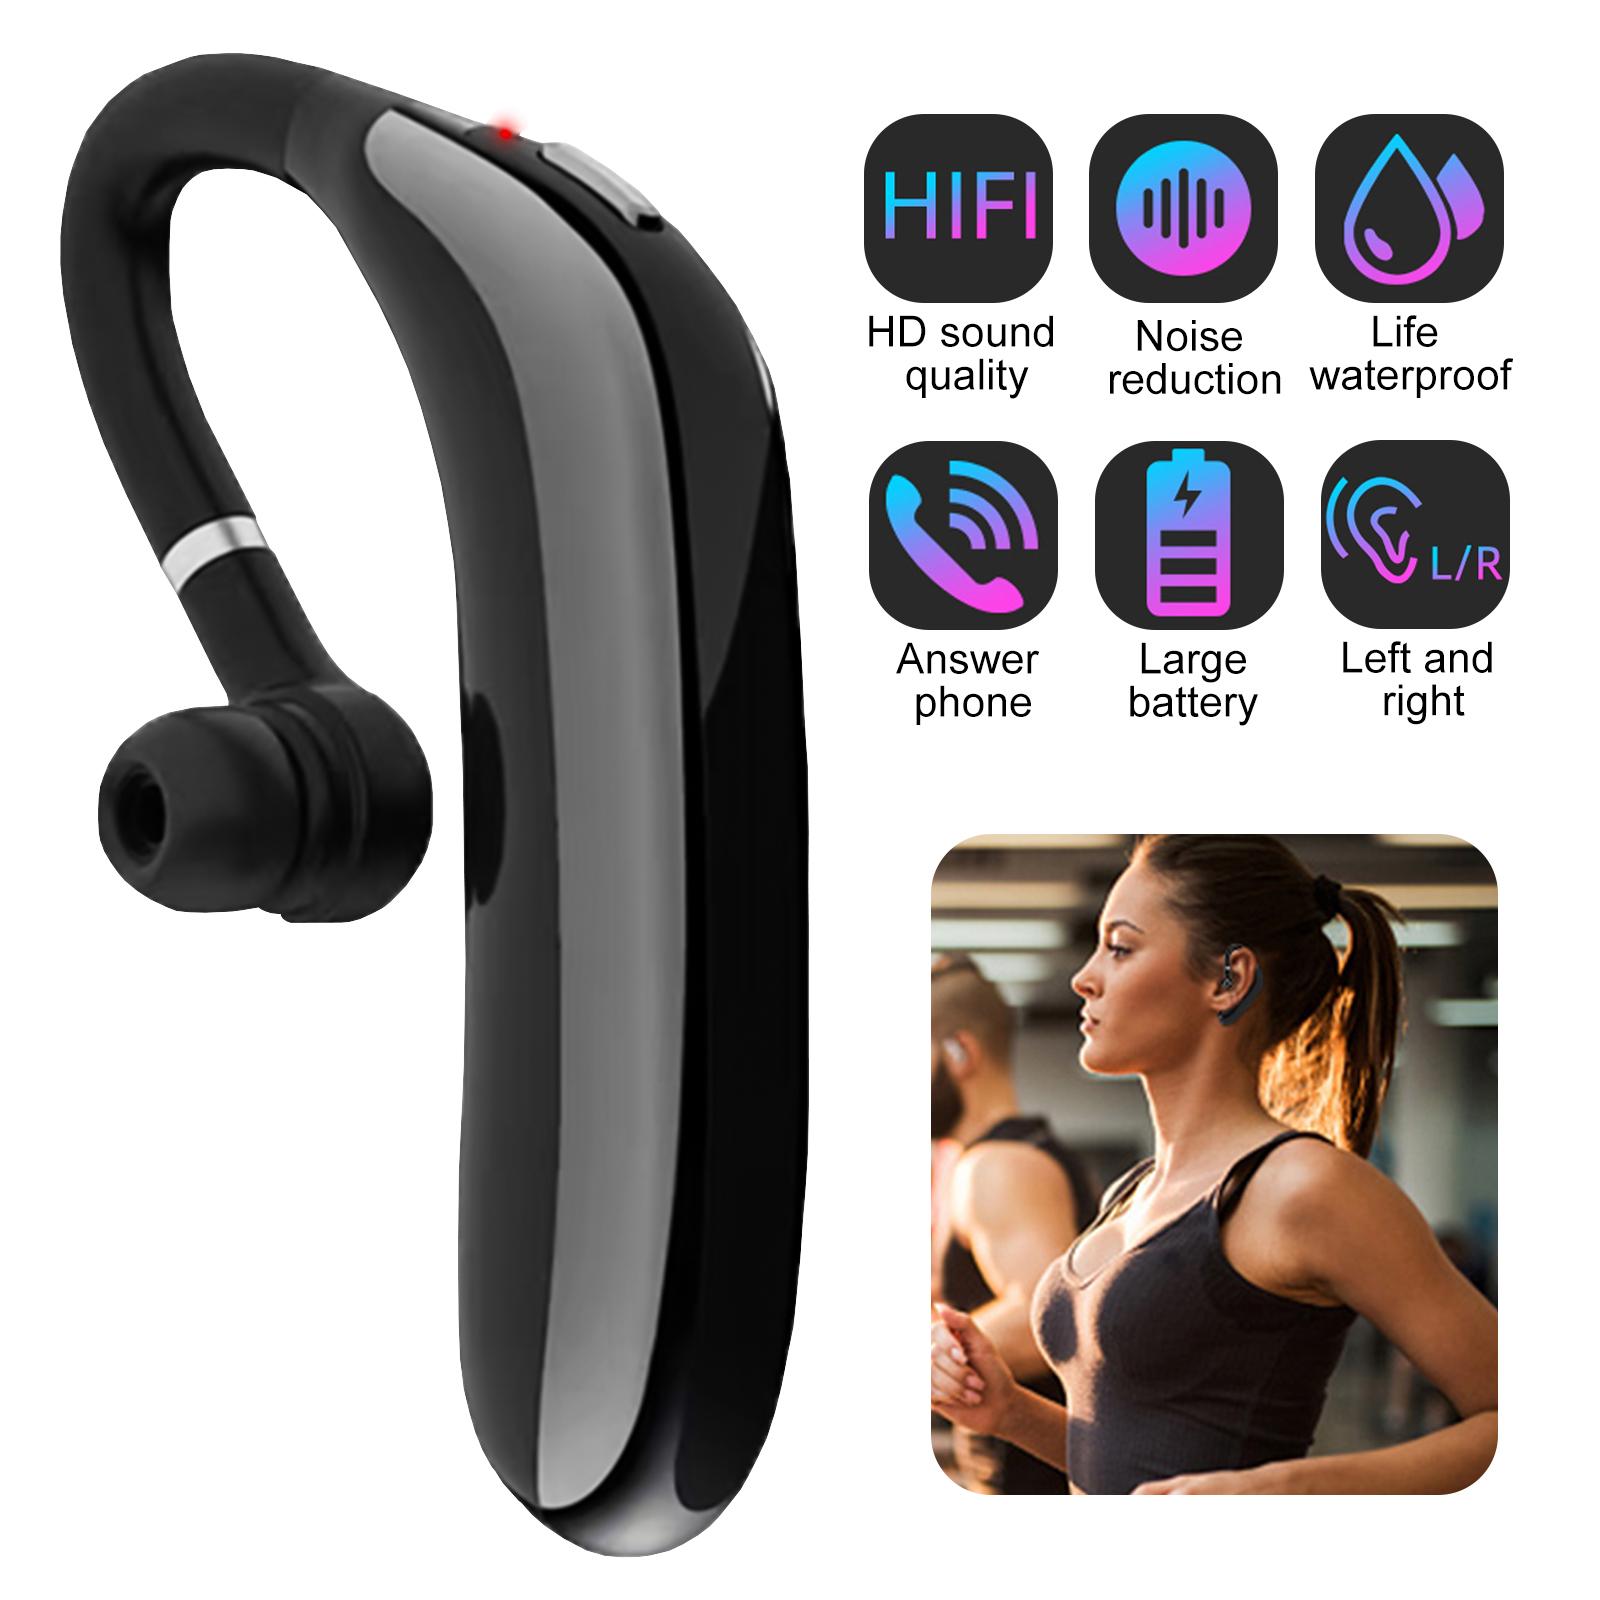 Tsv Bluetooth Headset Wireless Business Bluetooth 5 0 Earpiece Noise Reducing Wireless Headphones Built In Mic 45hr Talktime Ultralight Hands Free Earphones For Cell Phones Office Trucker Driving Walmart Com Walmart Com